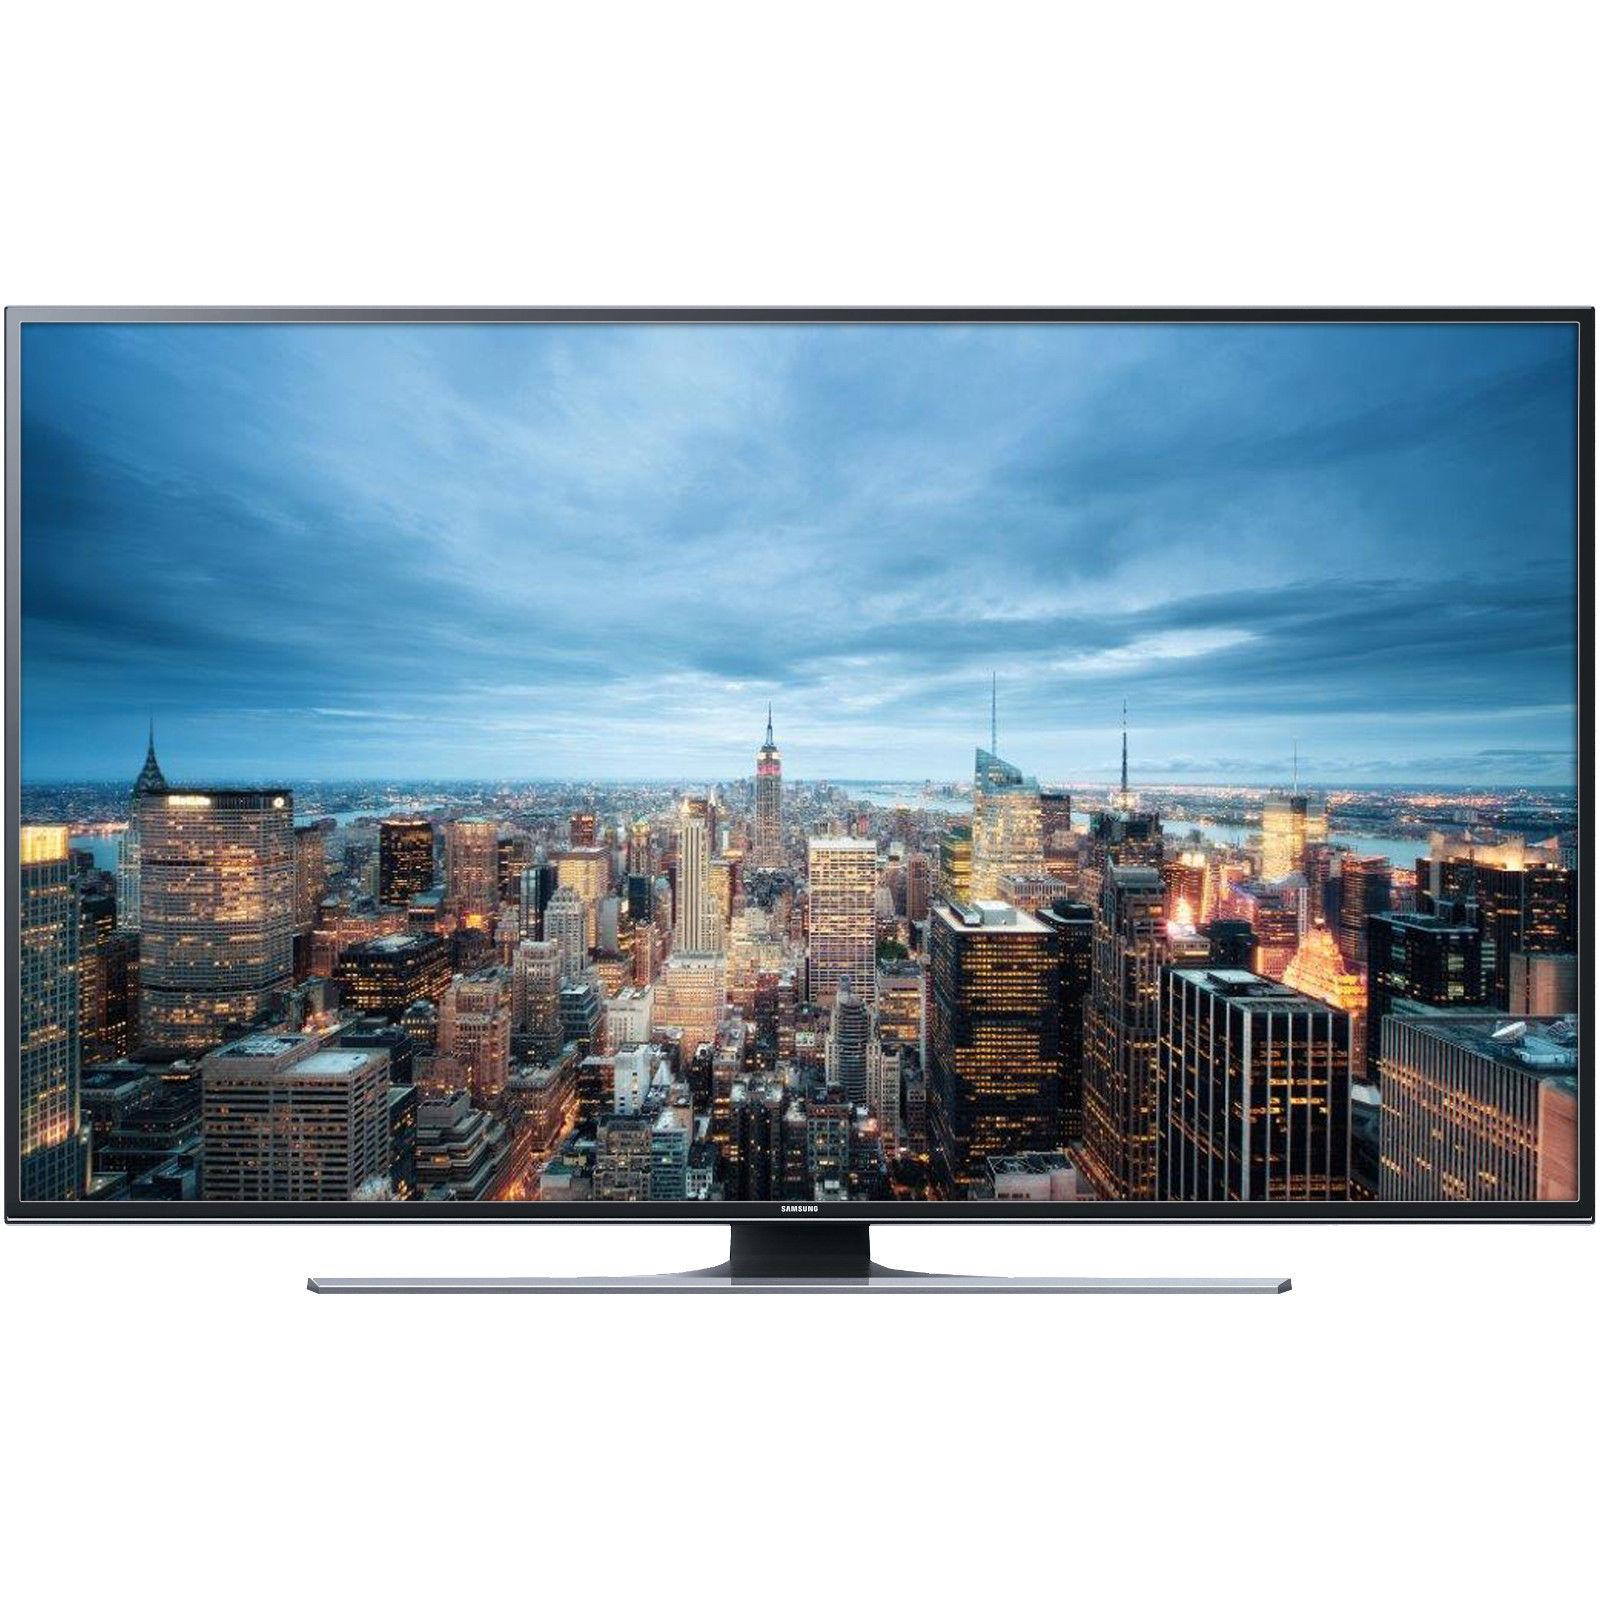 [ebay/Media Markt] Samsung UE65JU6450 163 cm (65 Zoll) Fernseher (Ultra HD, Triple Tuner, Smart TV) [Energieklasse A] für 1.399€